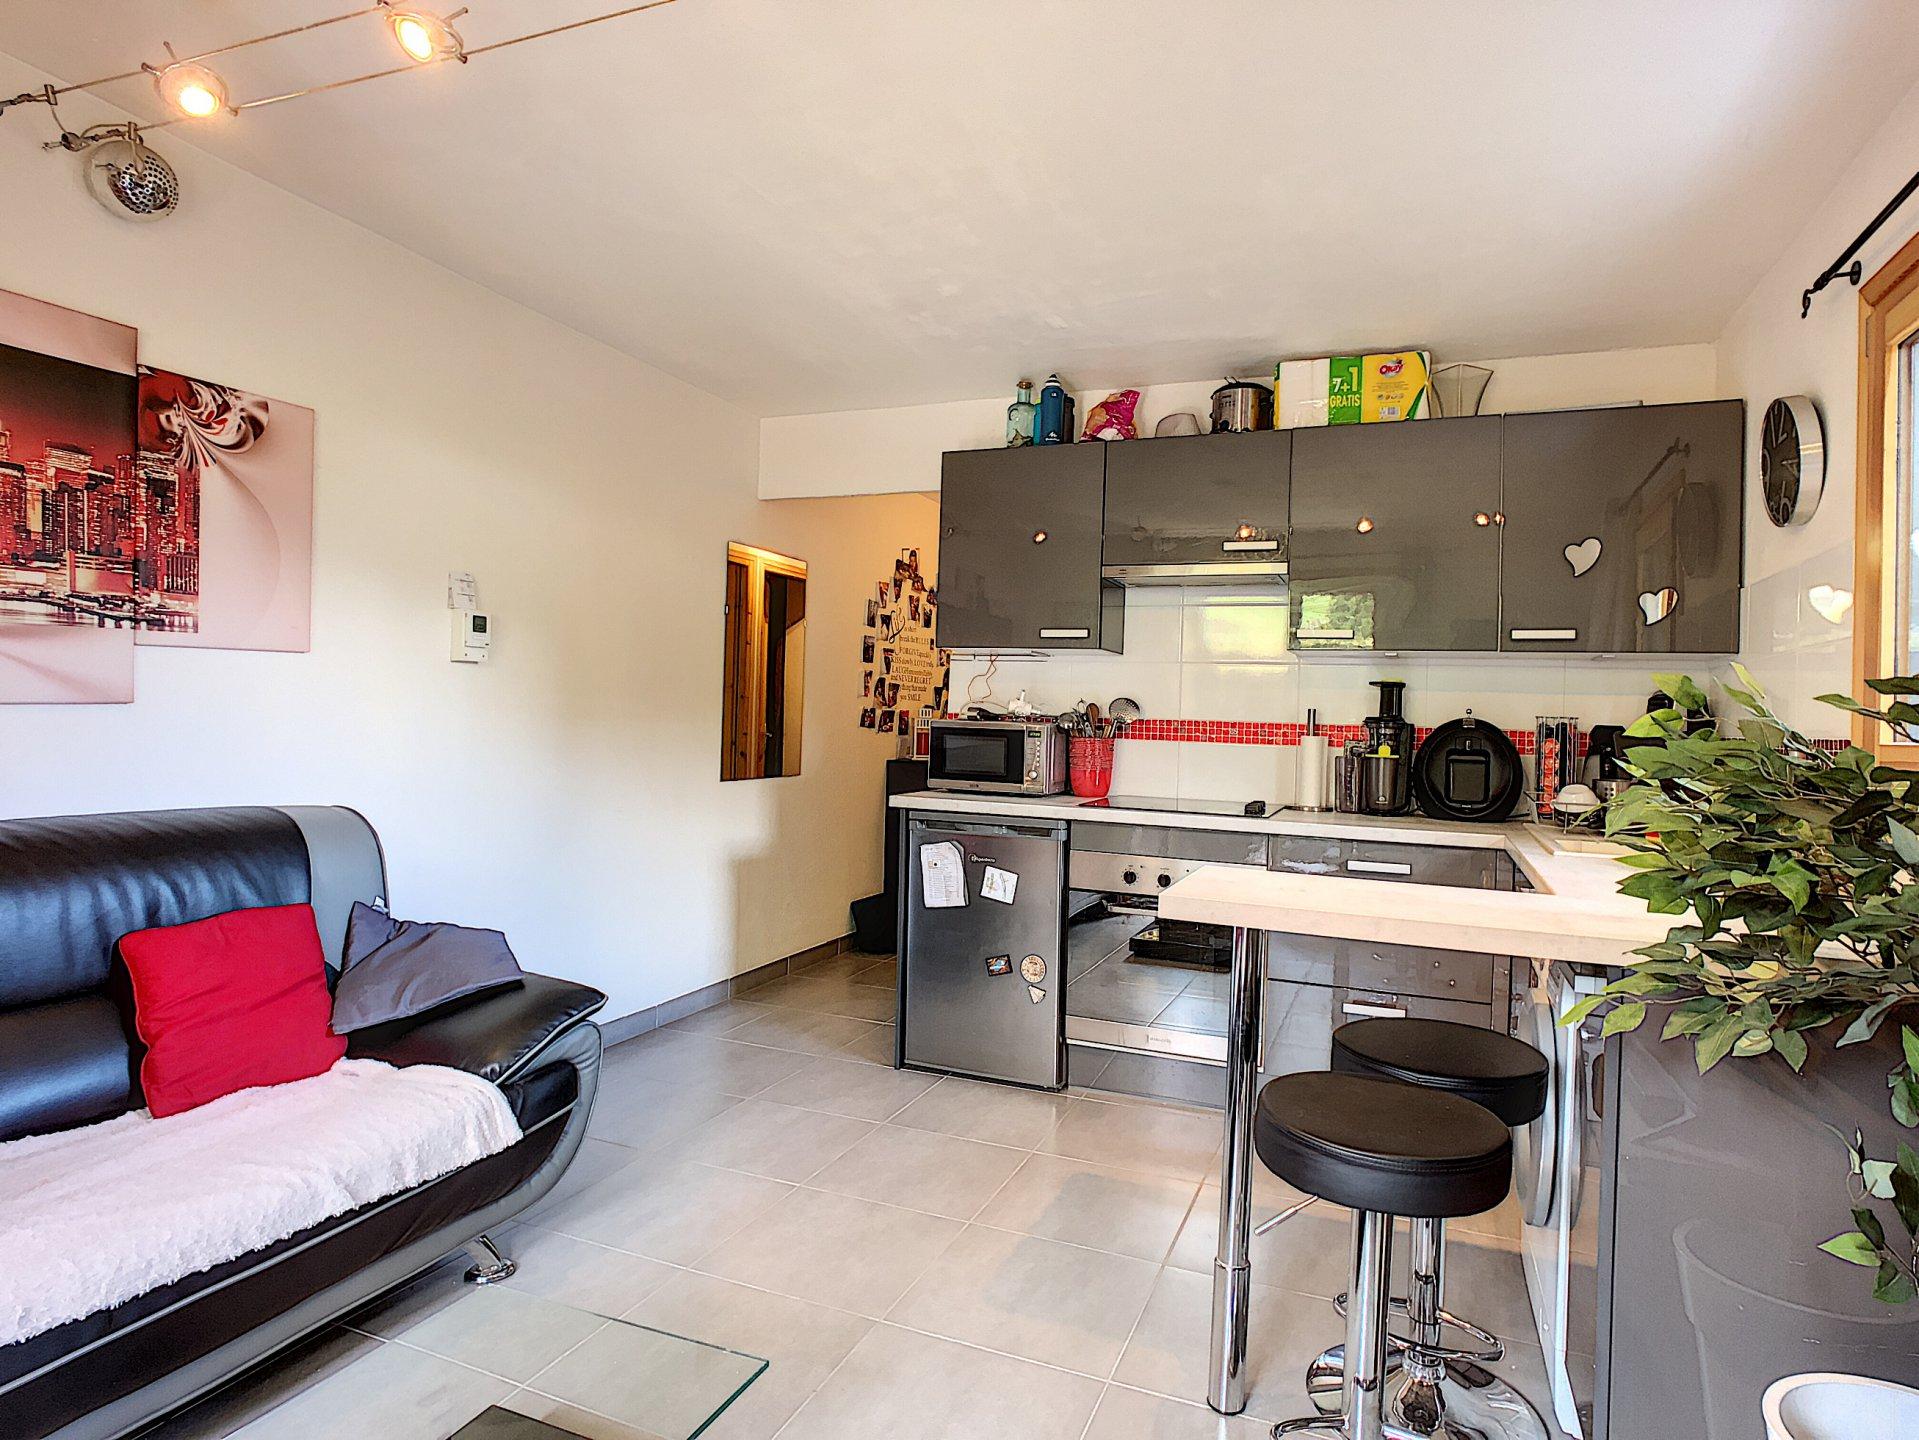 Appartamento 1 camera, Les Houches